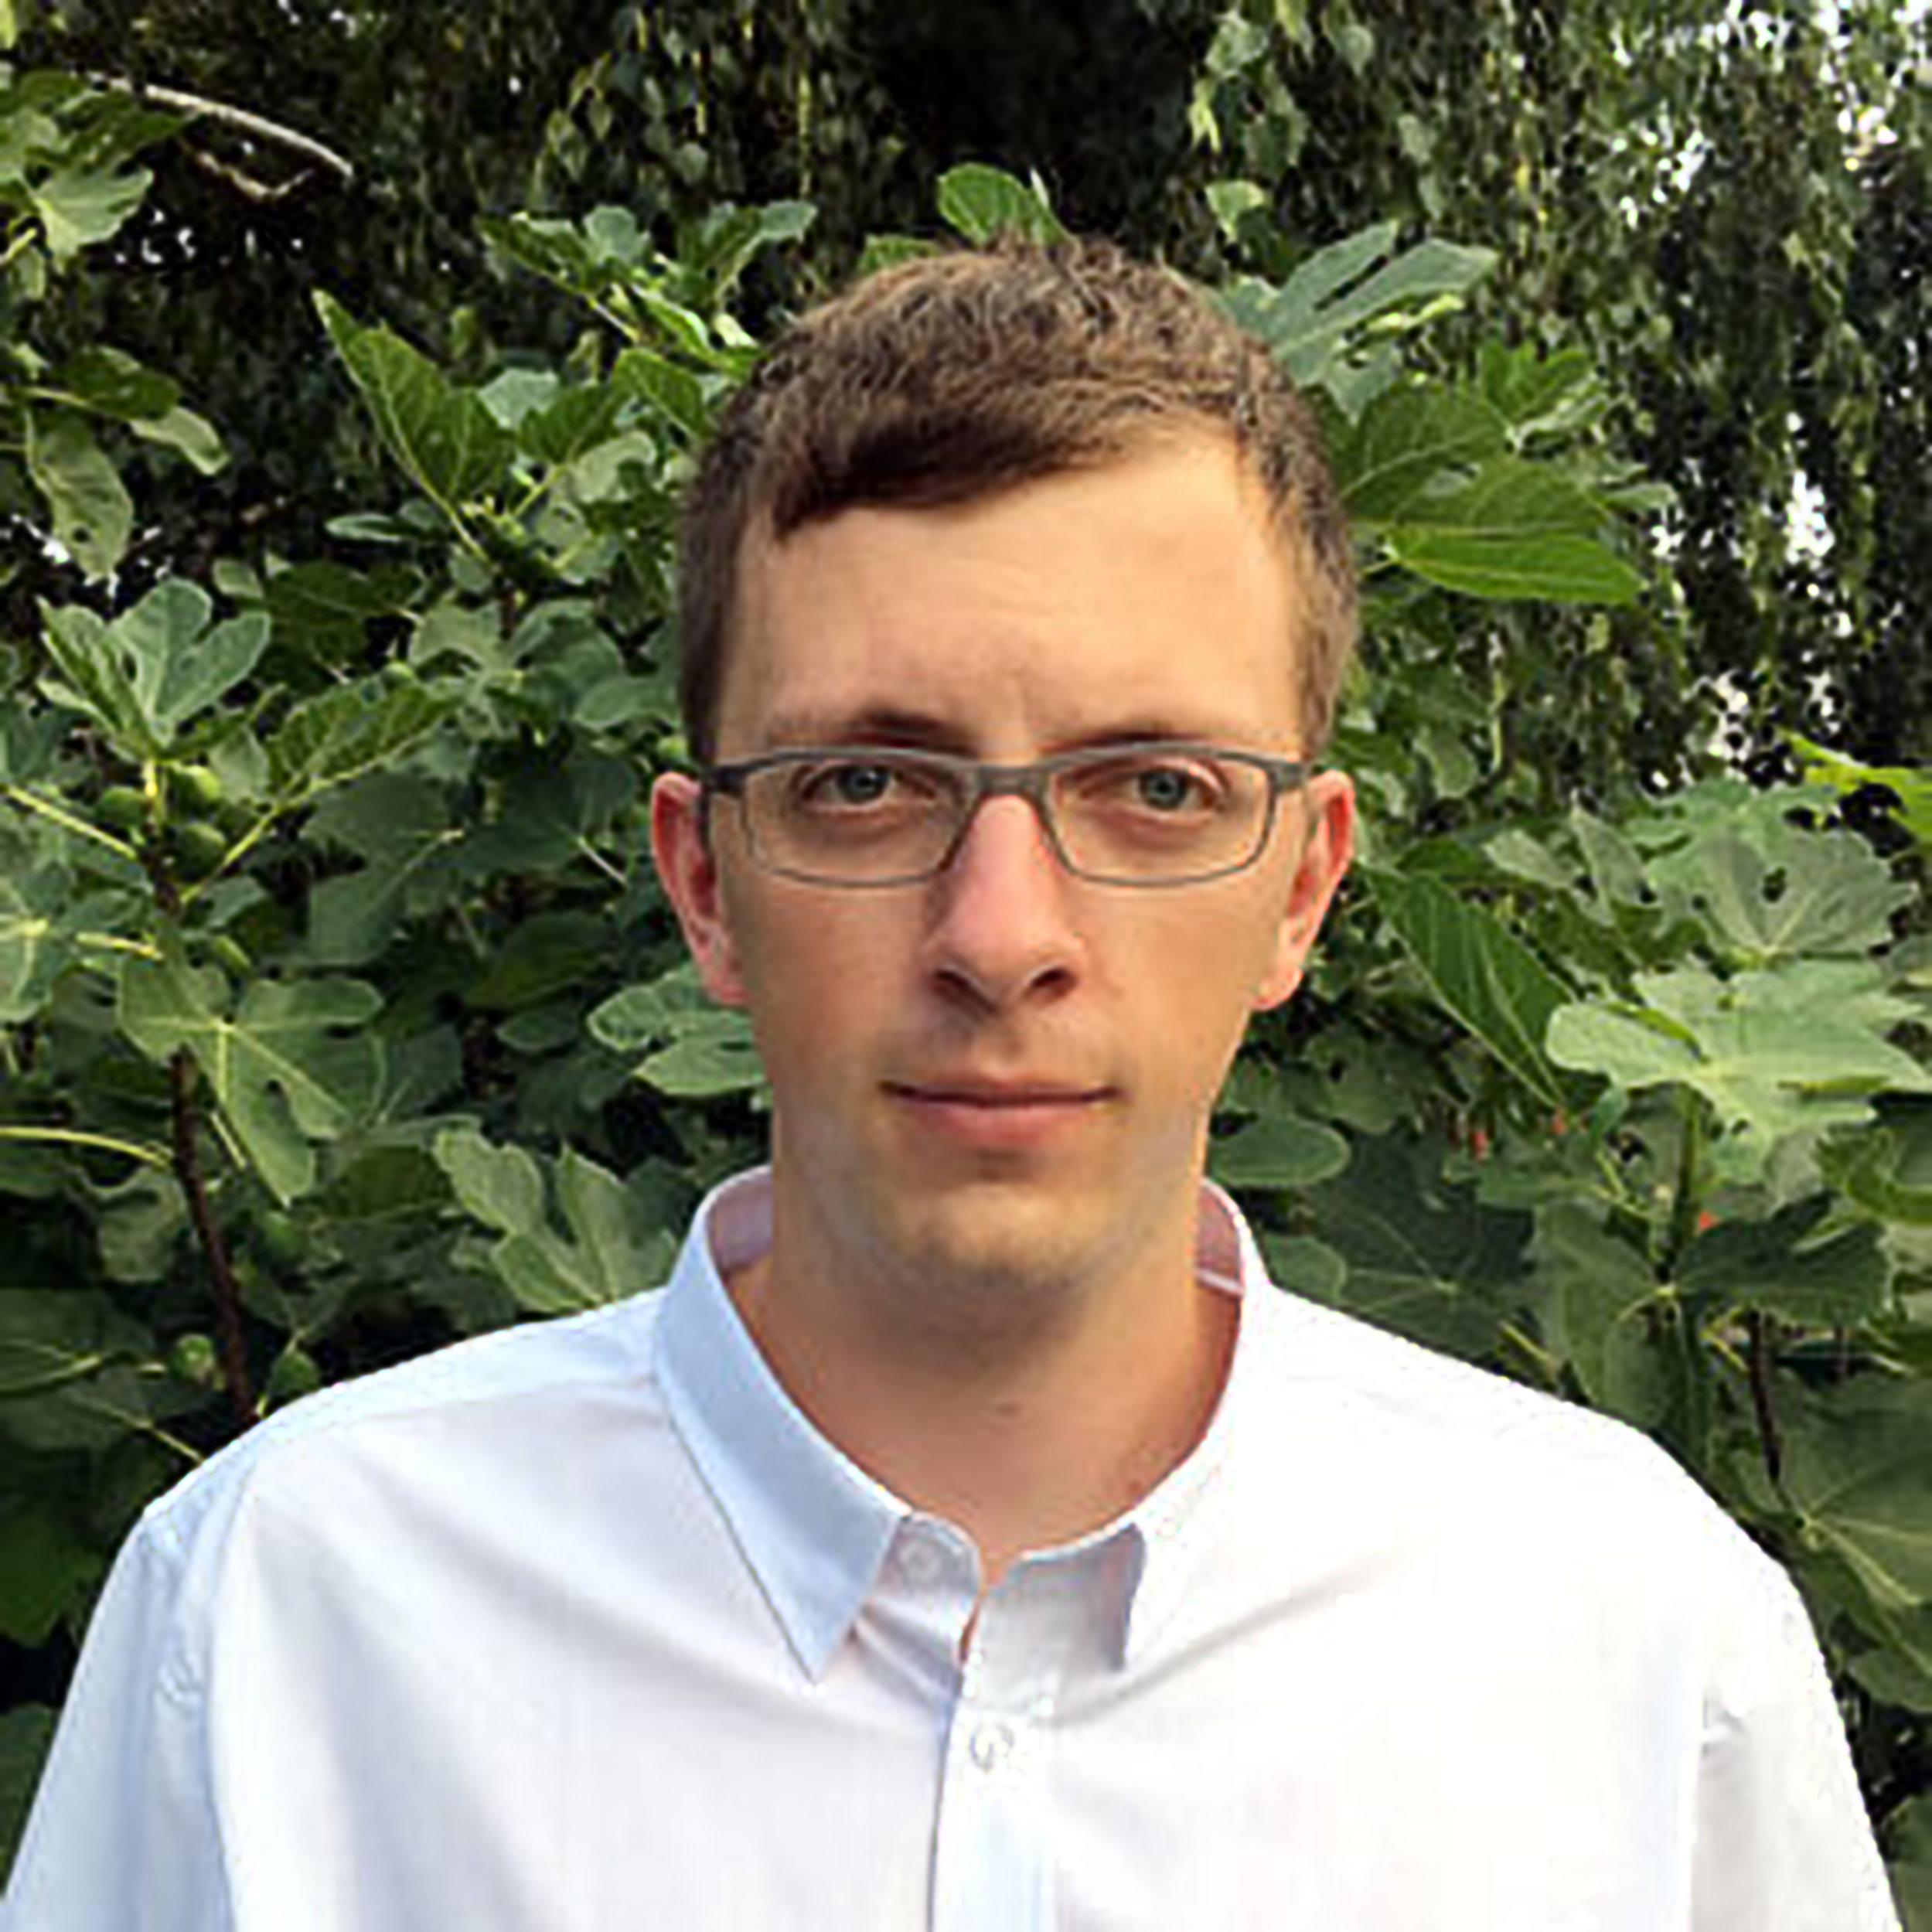 Aleš Casar, Software Engineer